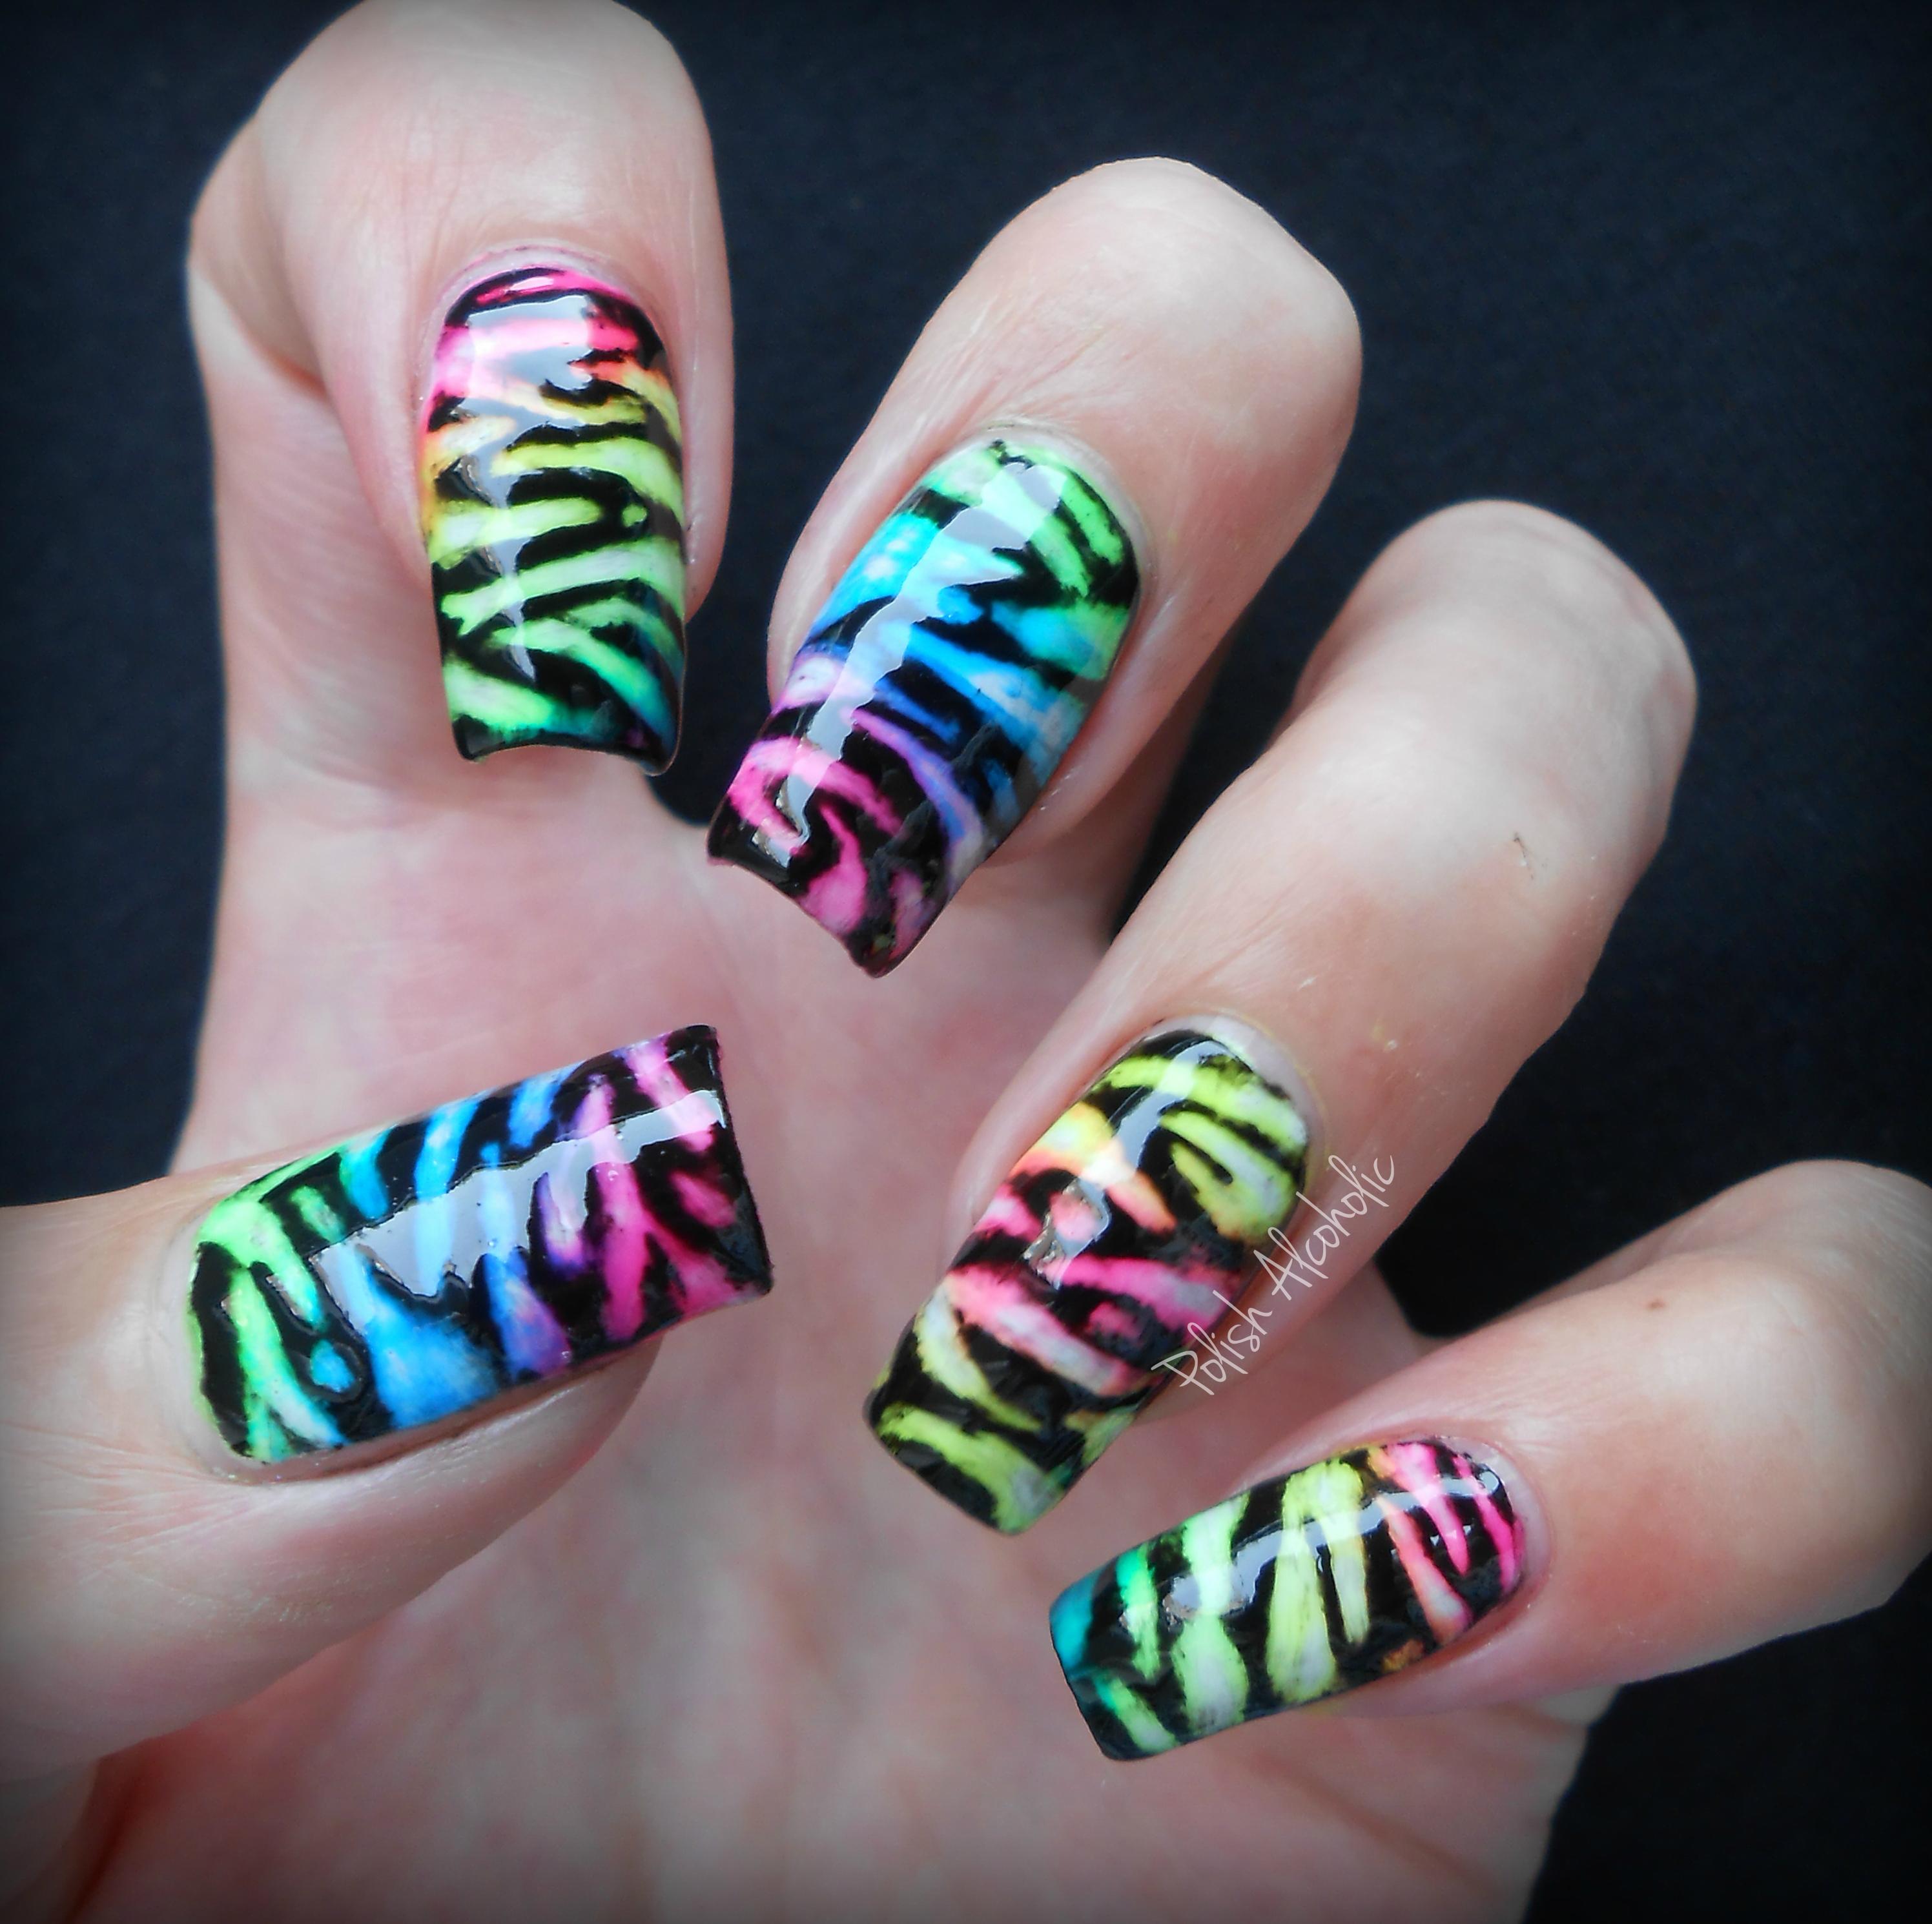 neon nails | Polish Alcoholic